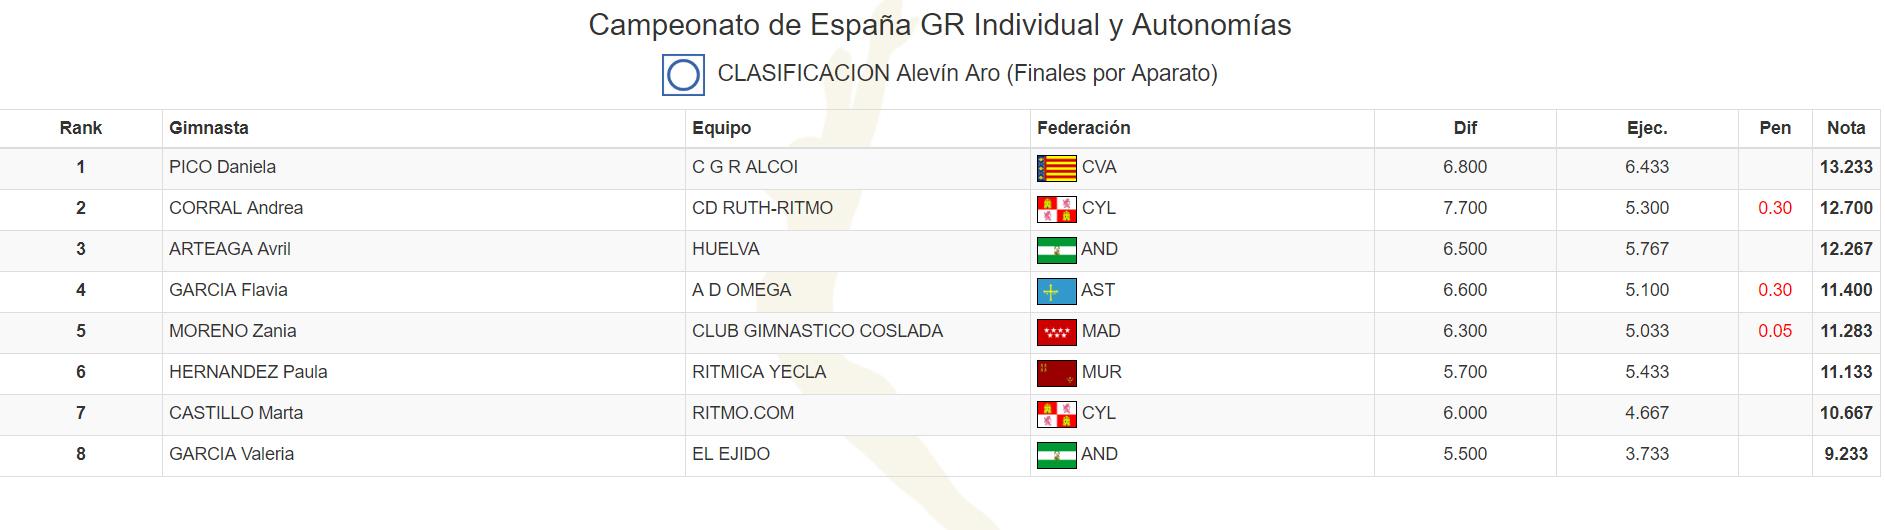 campeonato-espana-aro-paula-hernandez